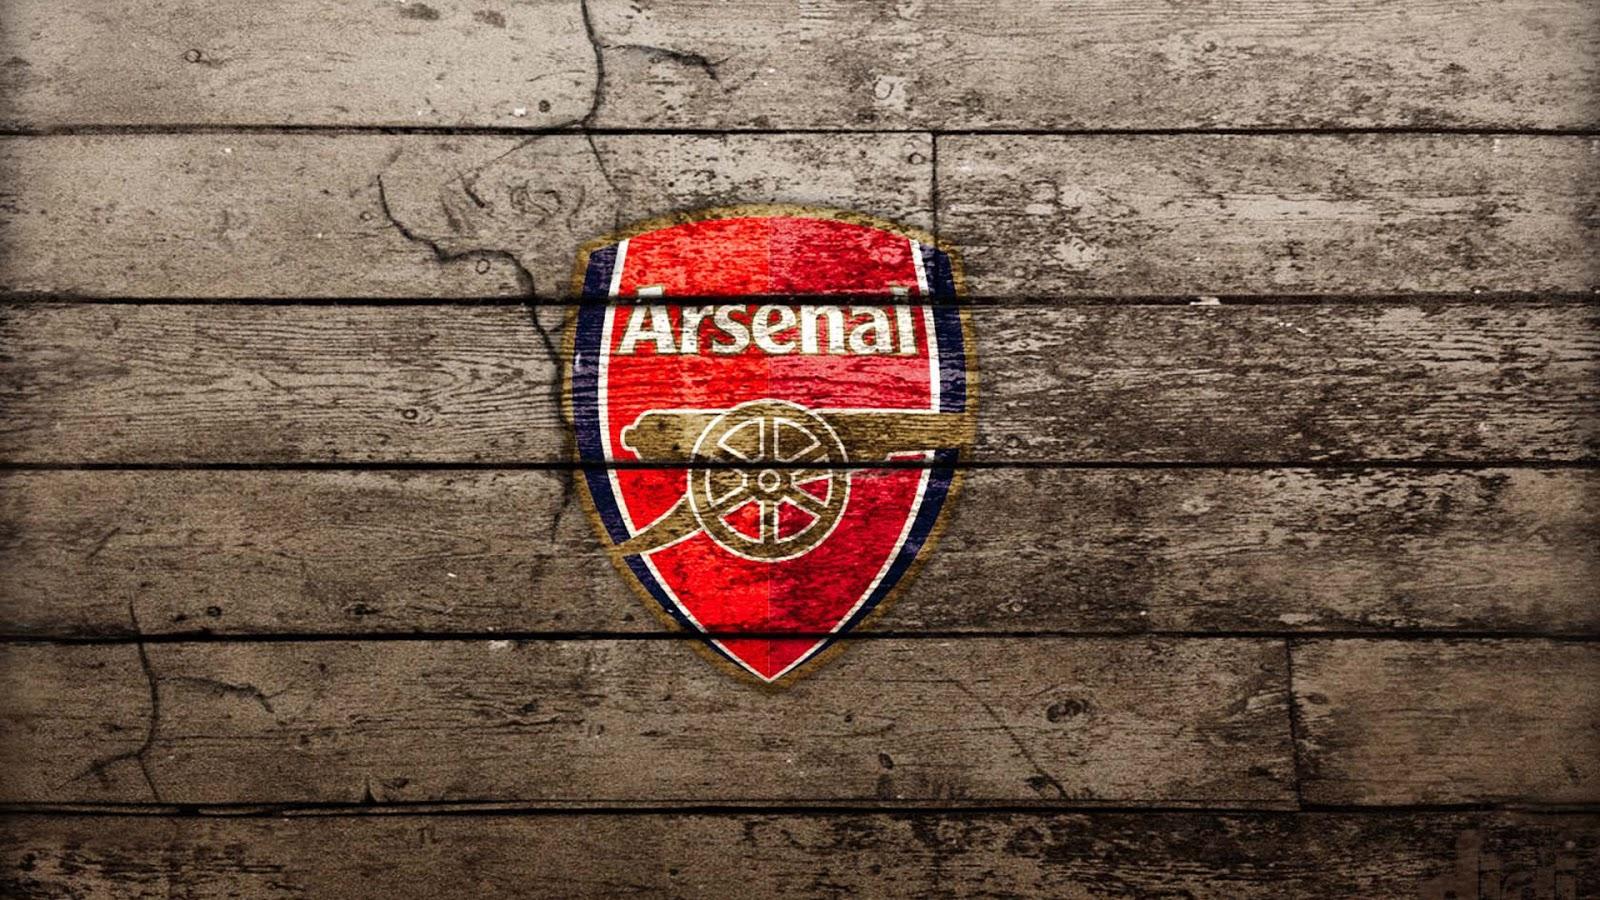 Srk 3d Wallpaper Wallpapers Hd For Mac Arsenal Football Club Logo Wallpaper Hd